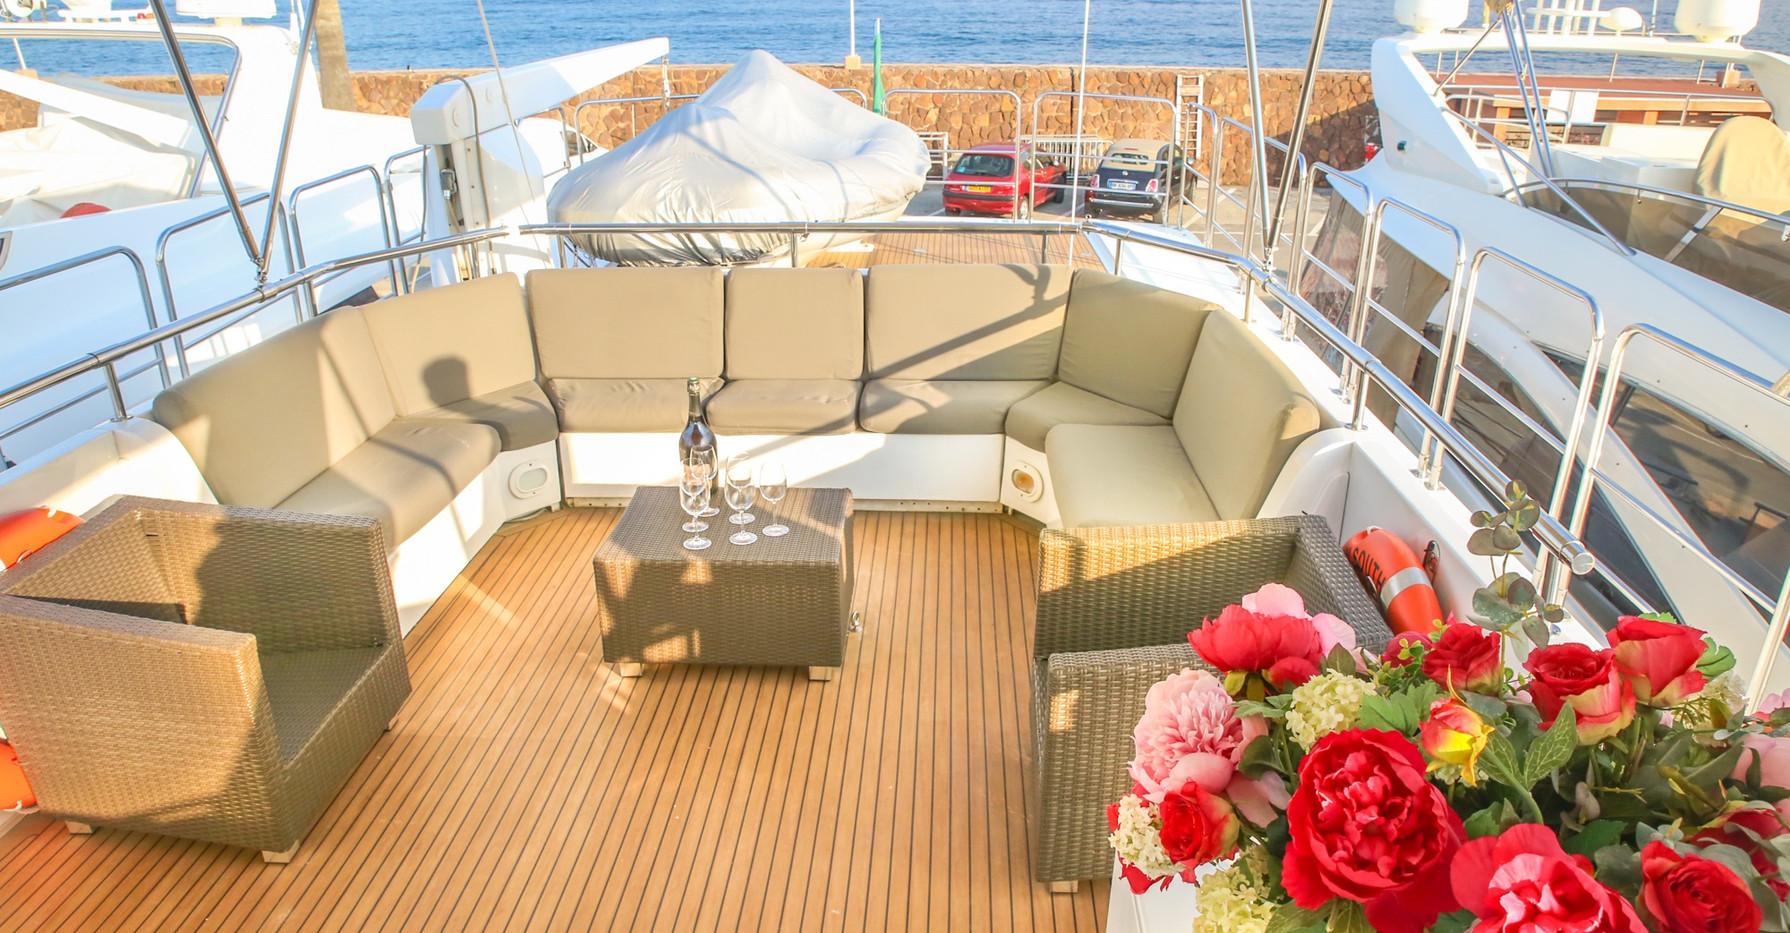 seven-yachts-charter-2.jpg